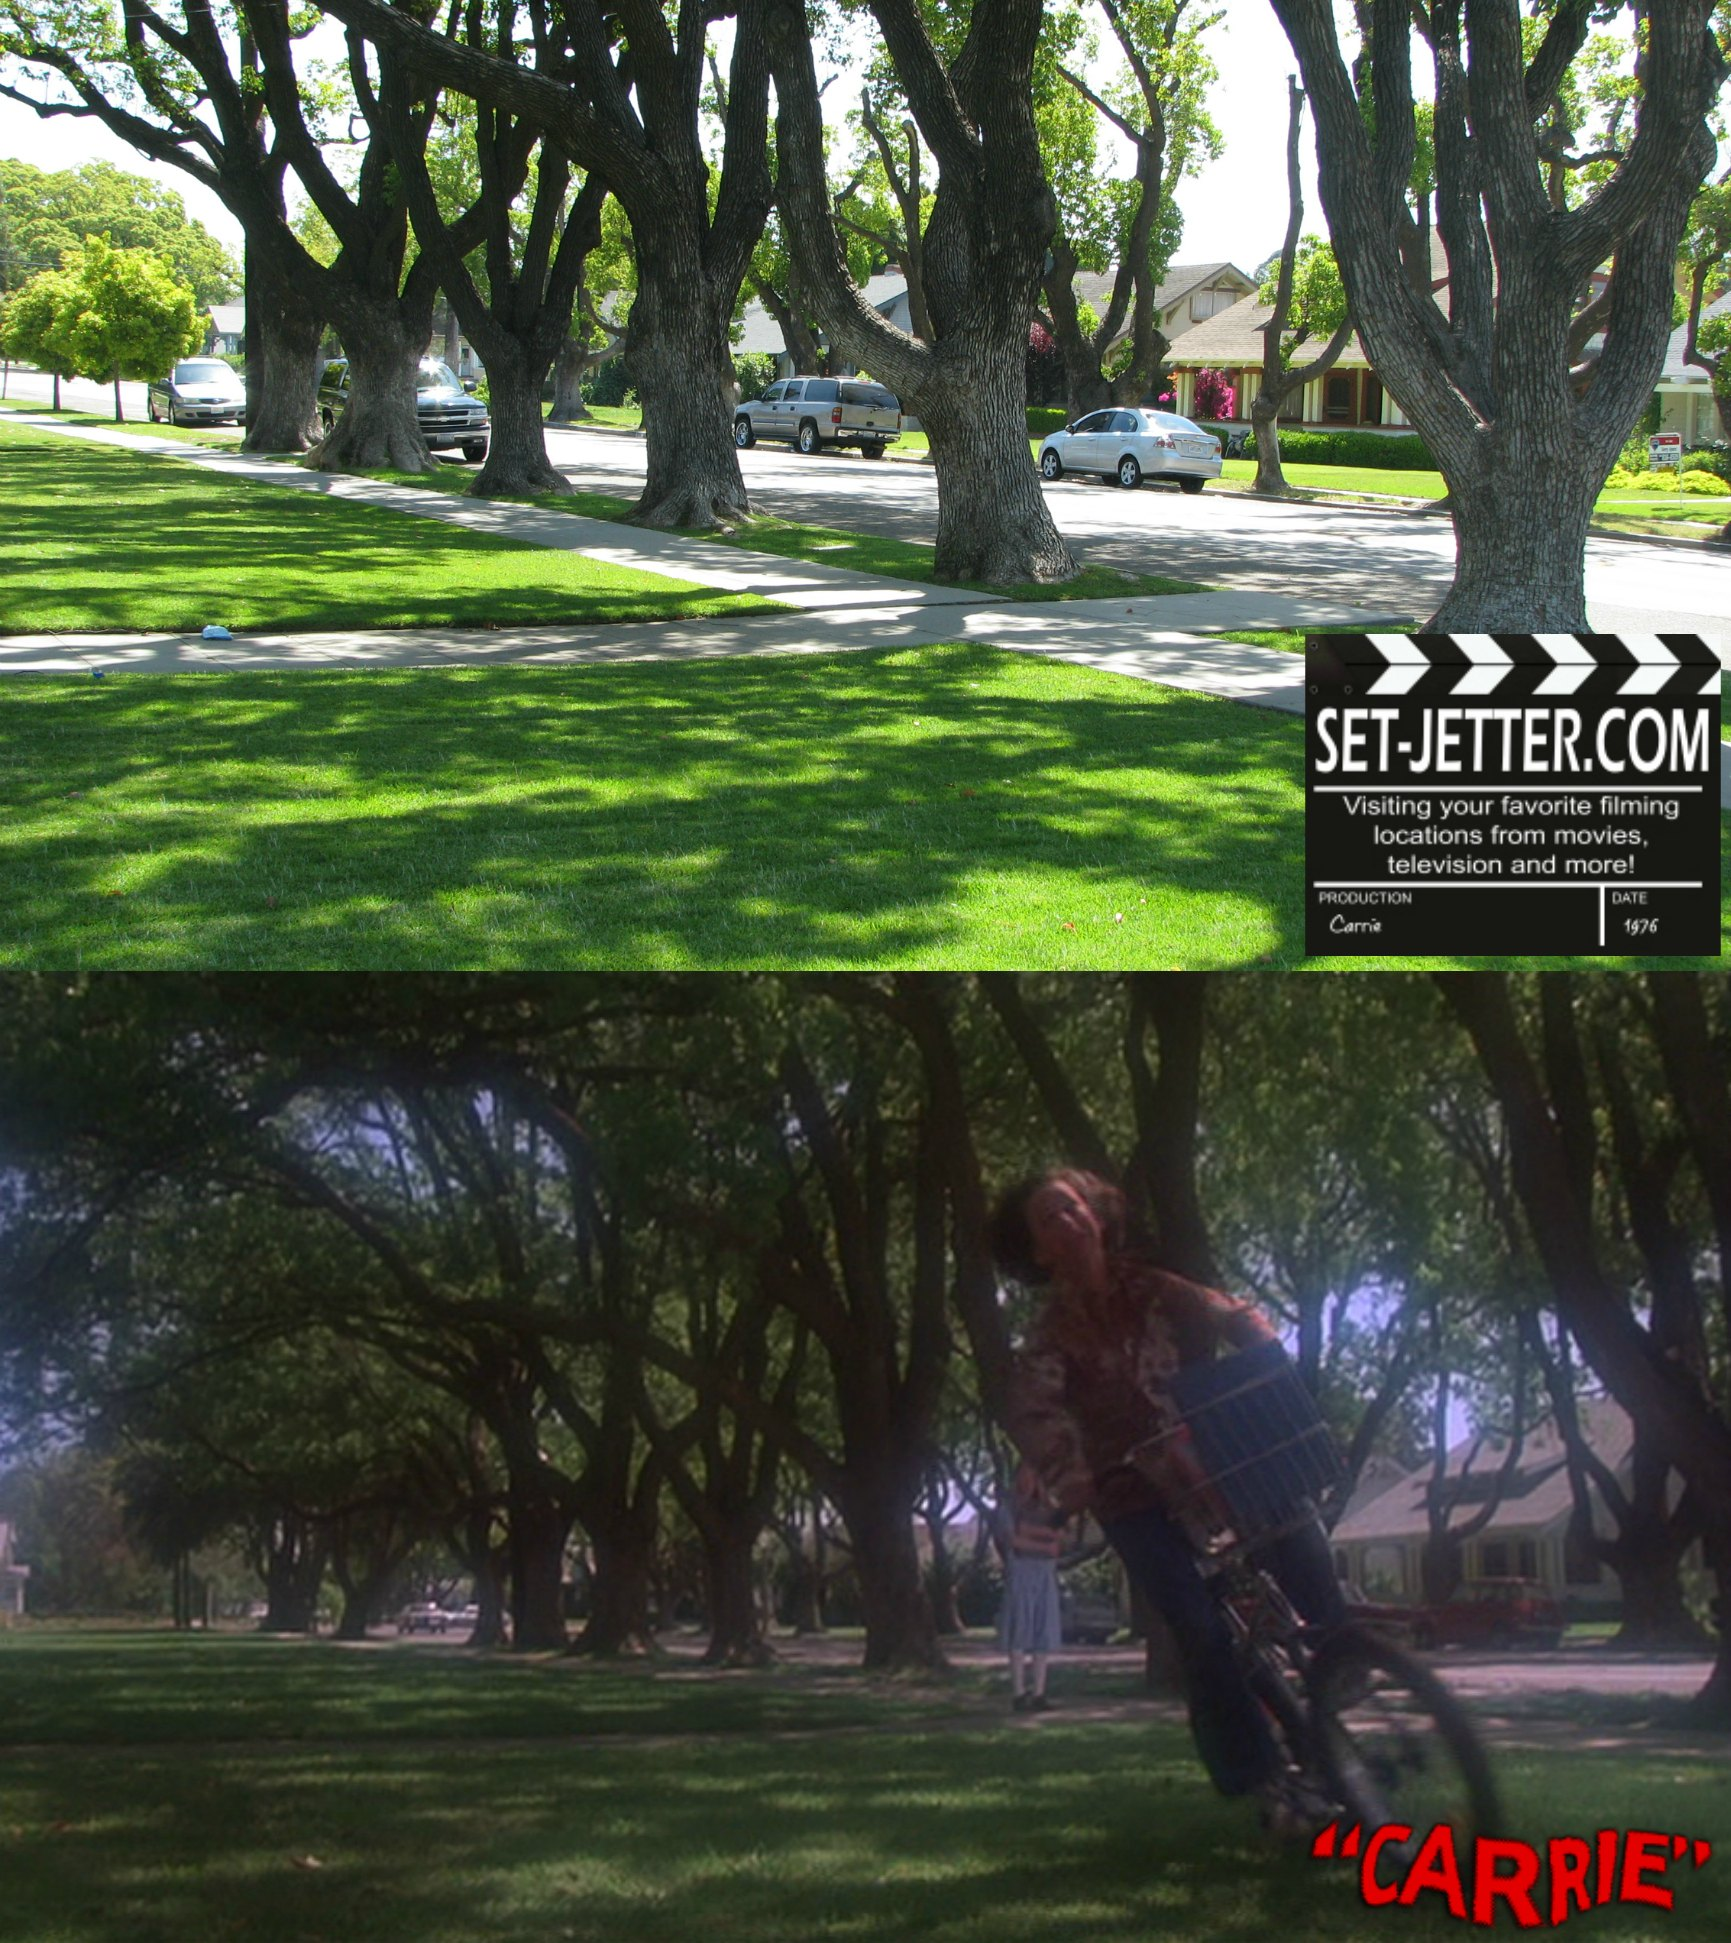 carrie trees 07.jpg